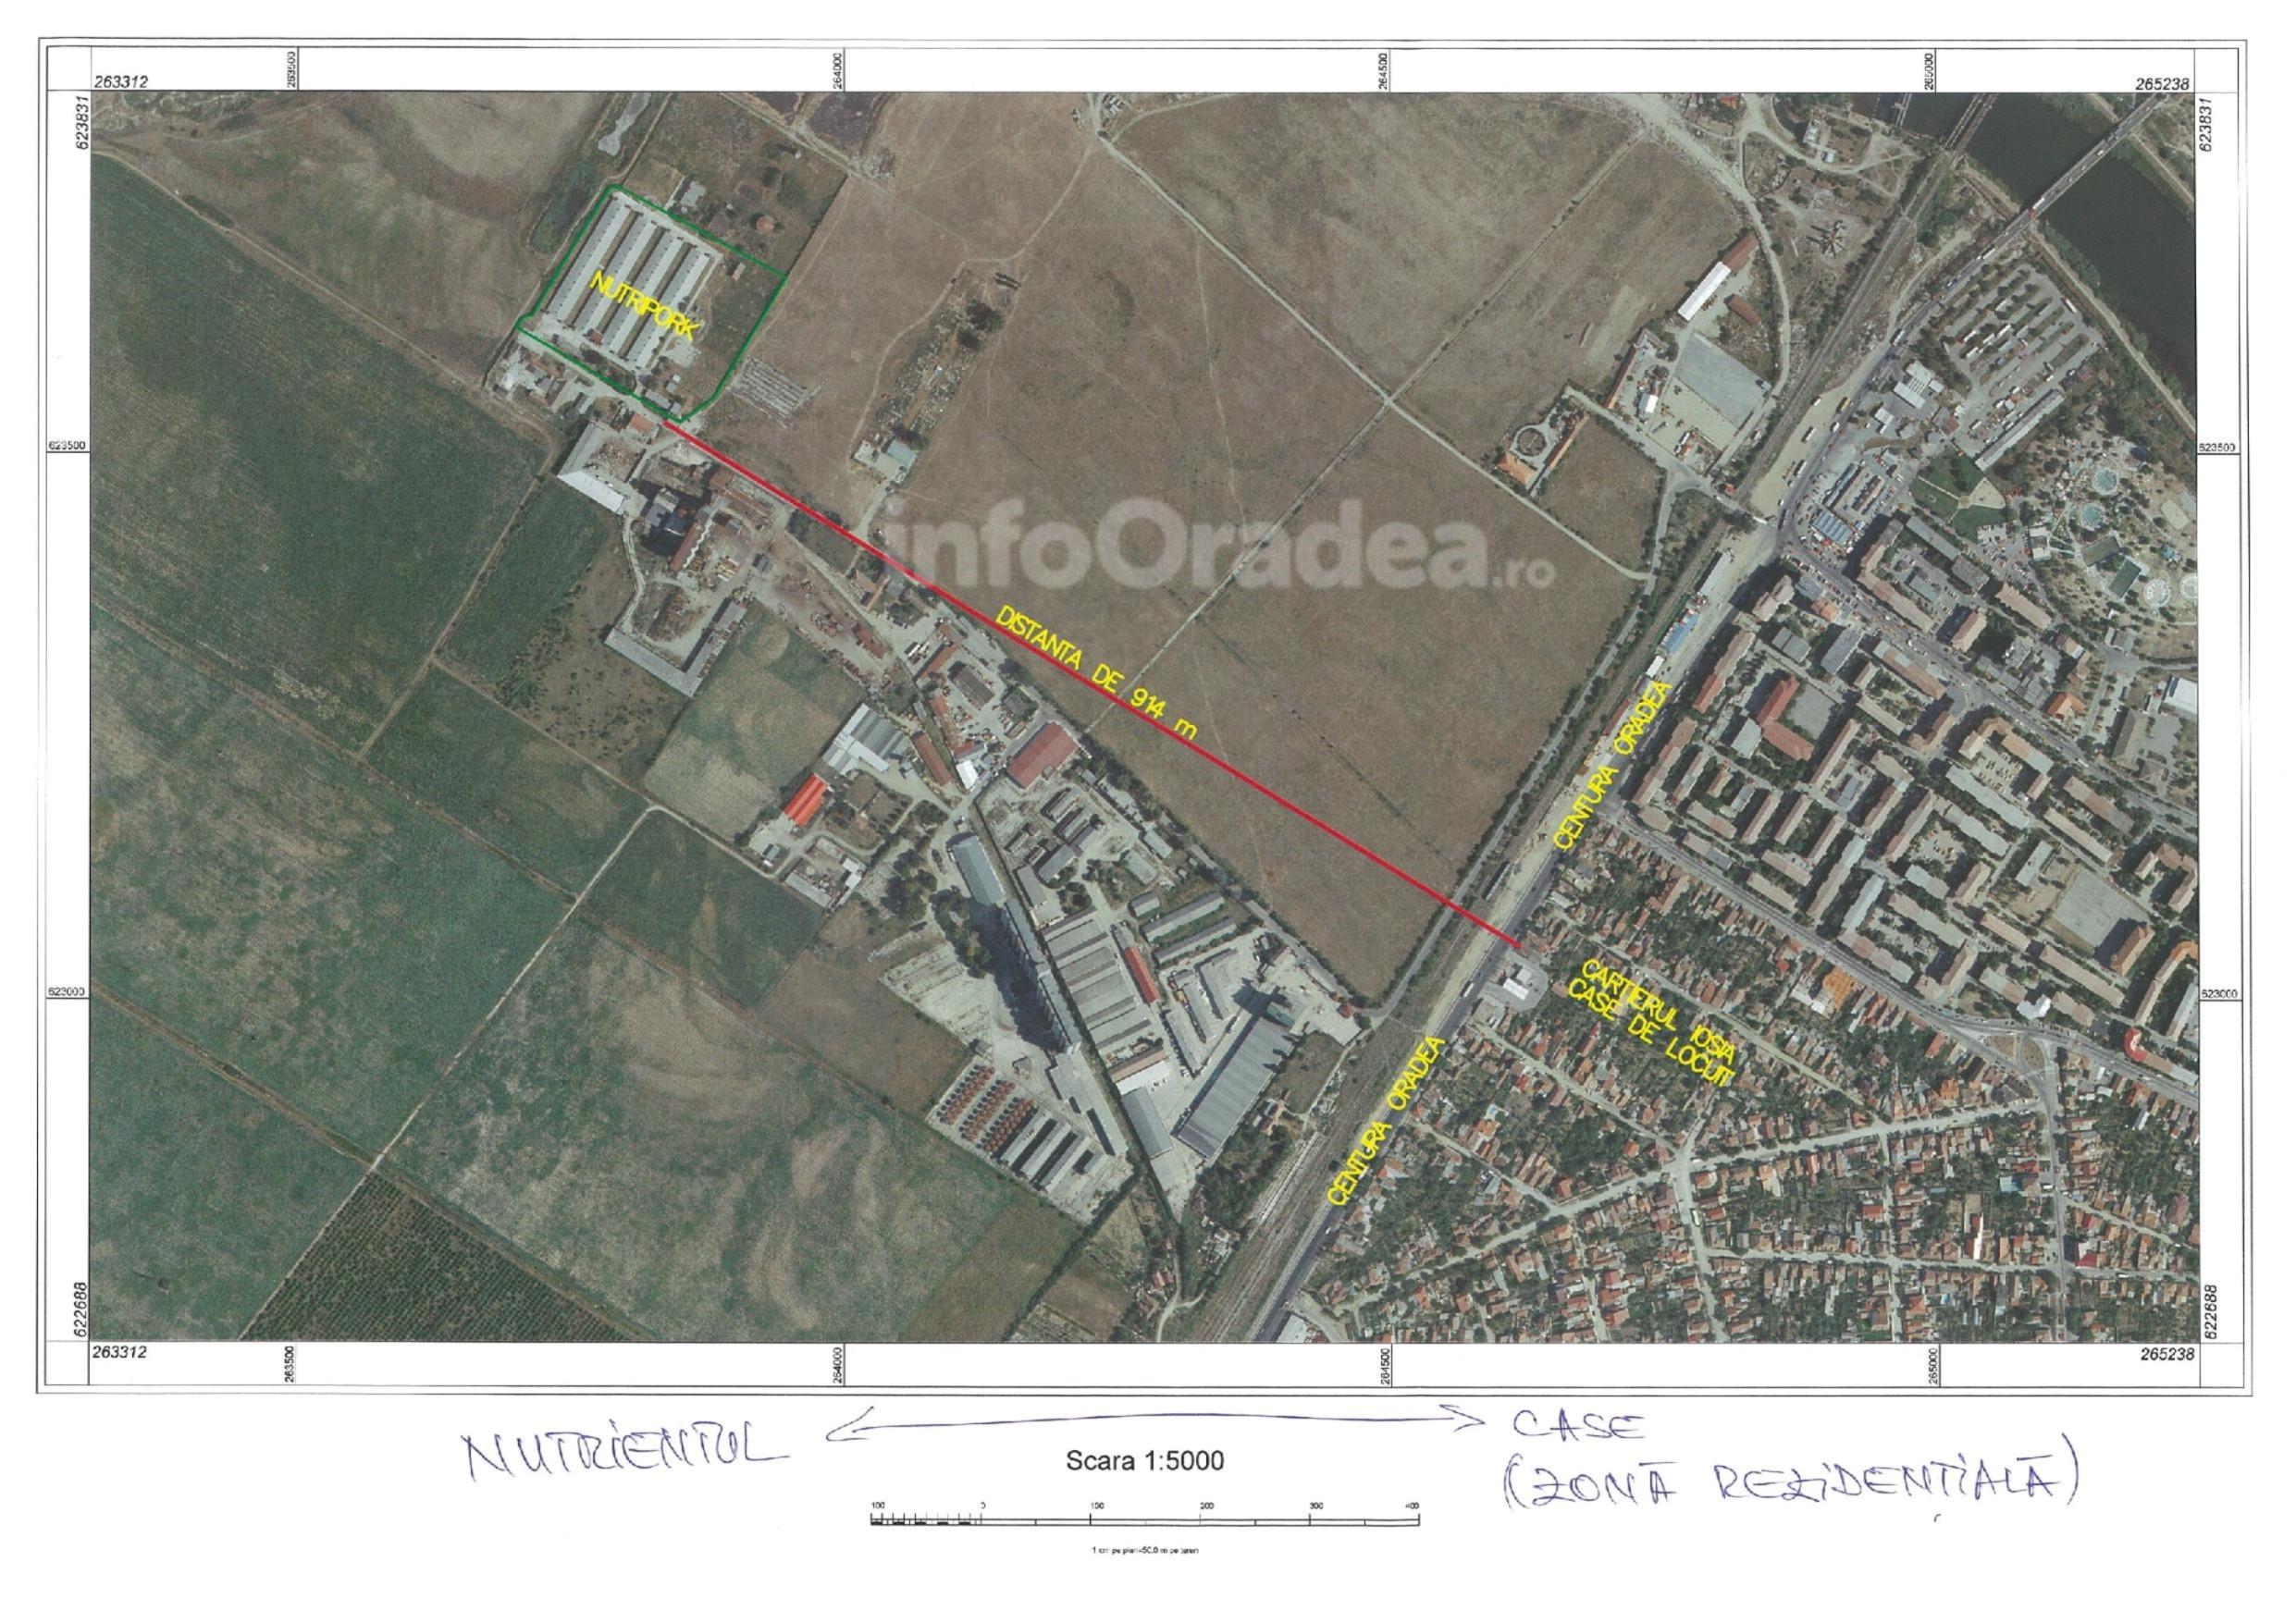 distanta nutripork - Oradea 914 m